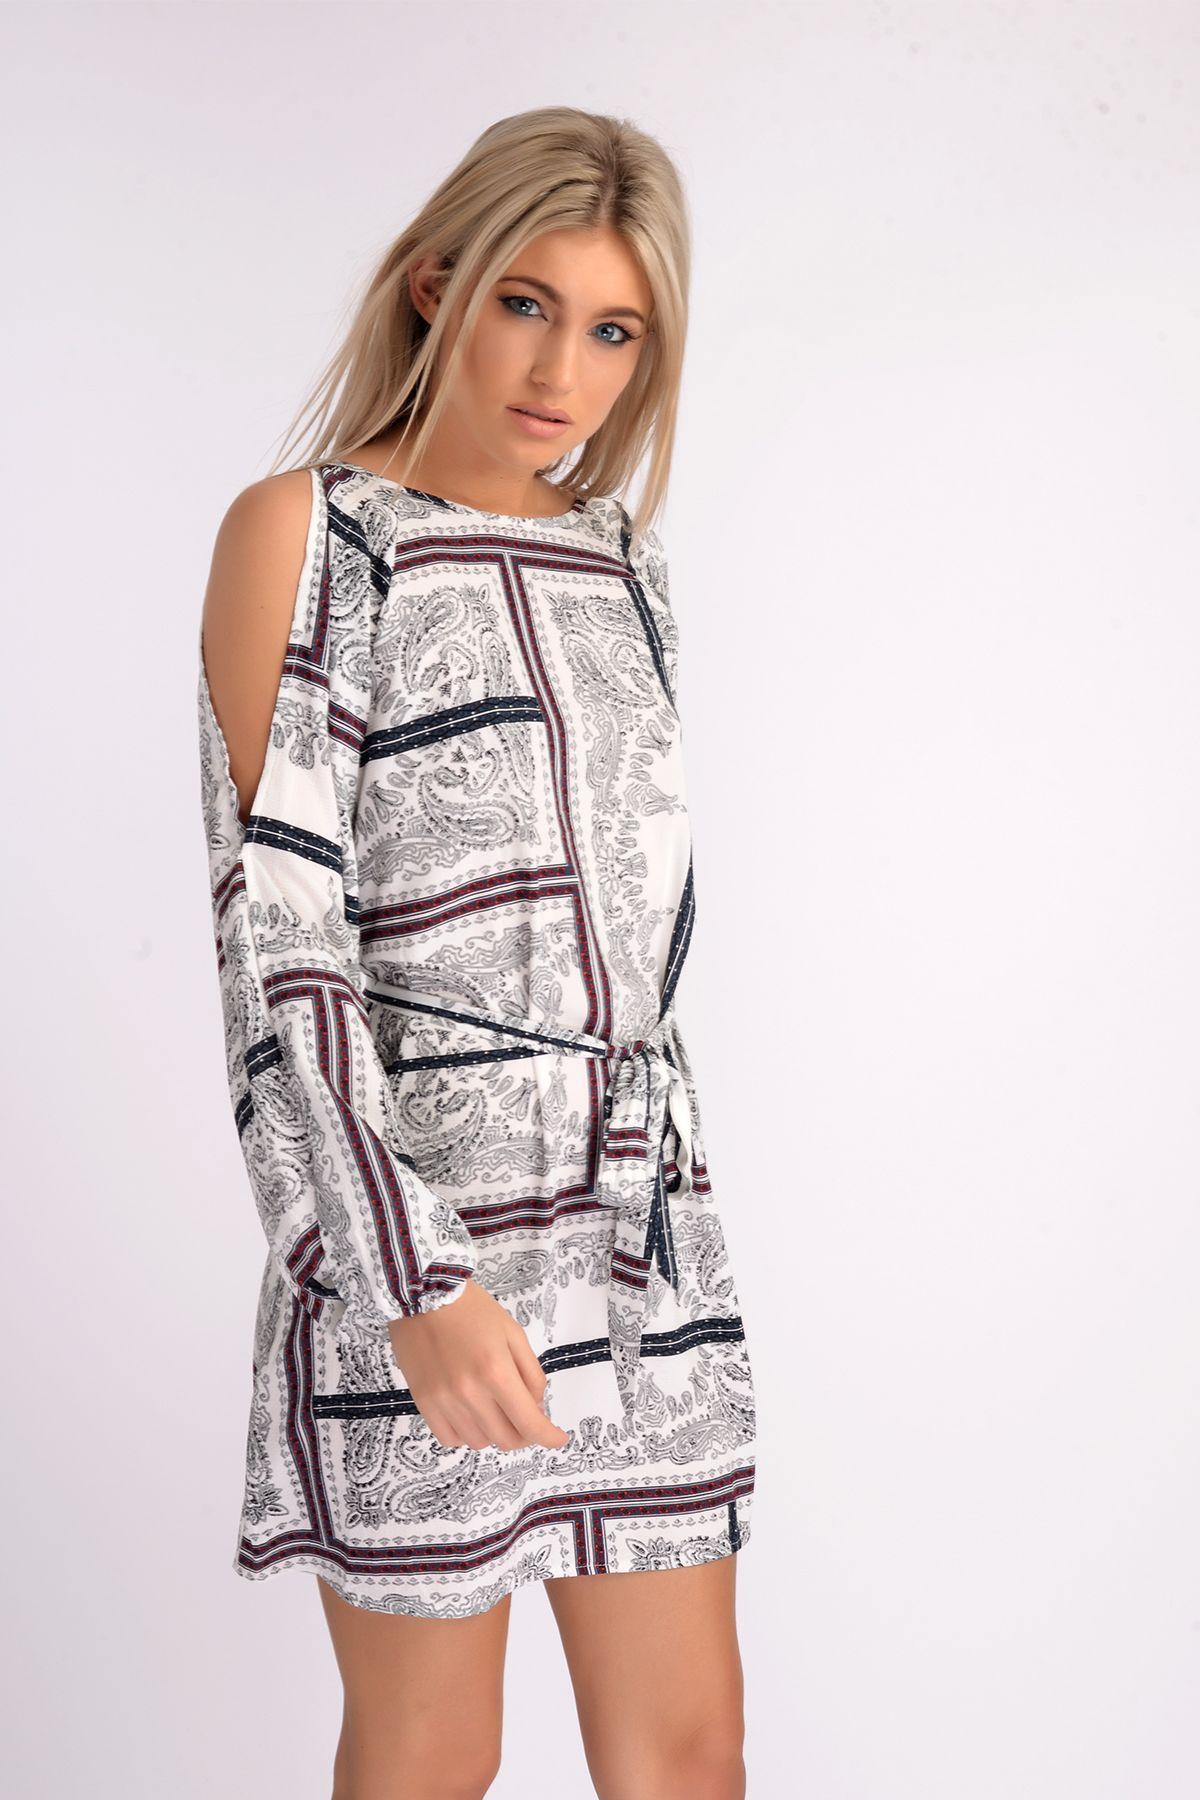 Wear you Trendswould a peekaboo lace dress advise to wear for summer in 2019